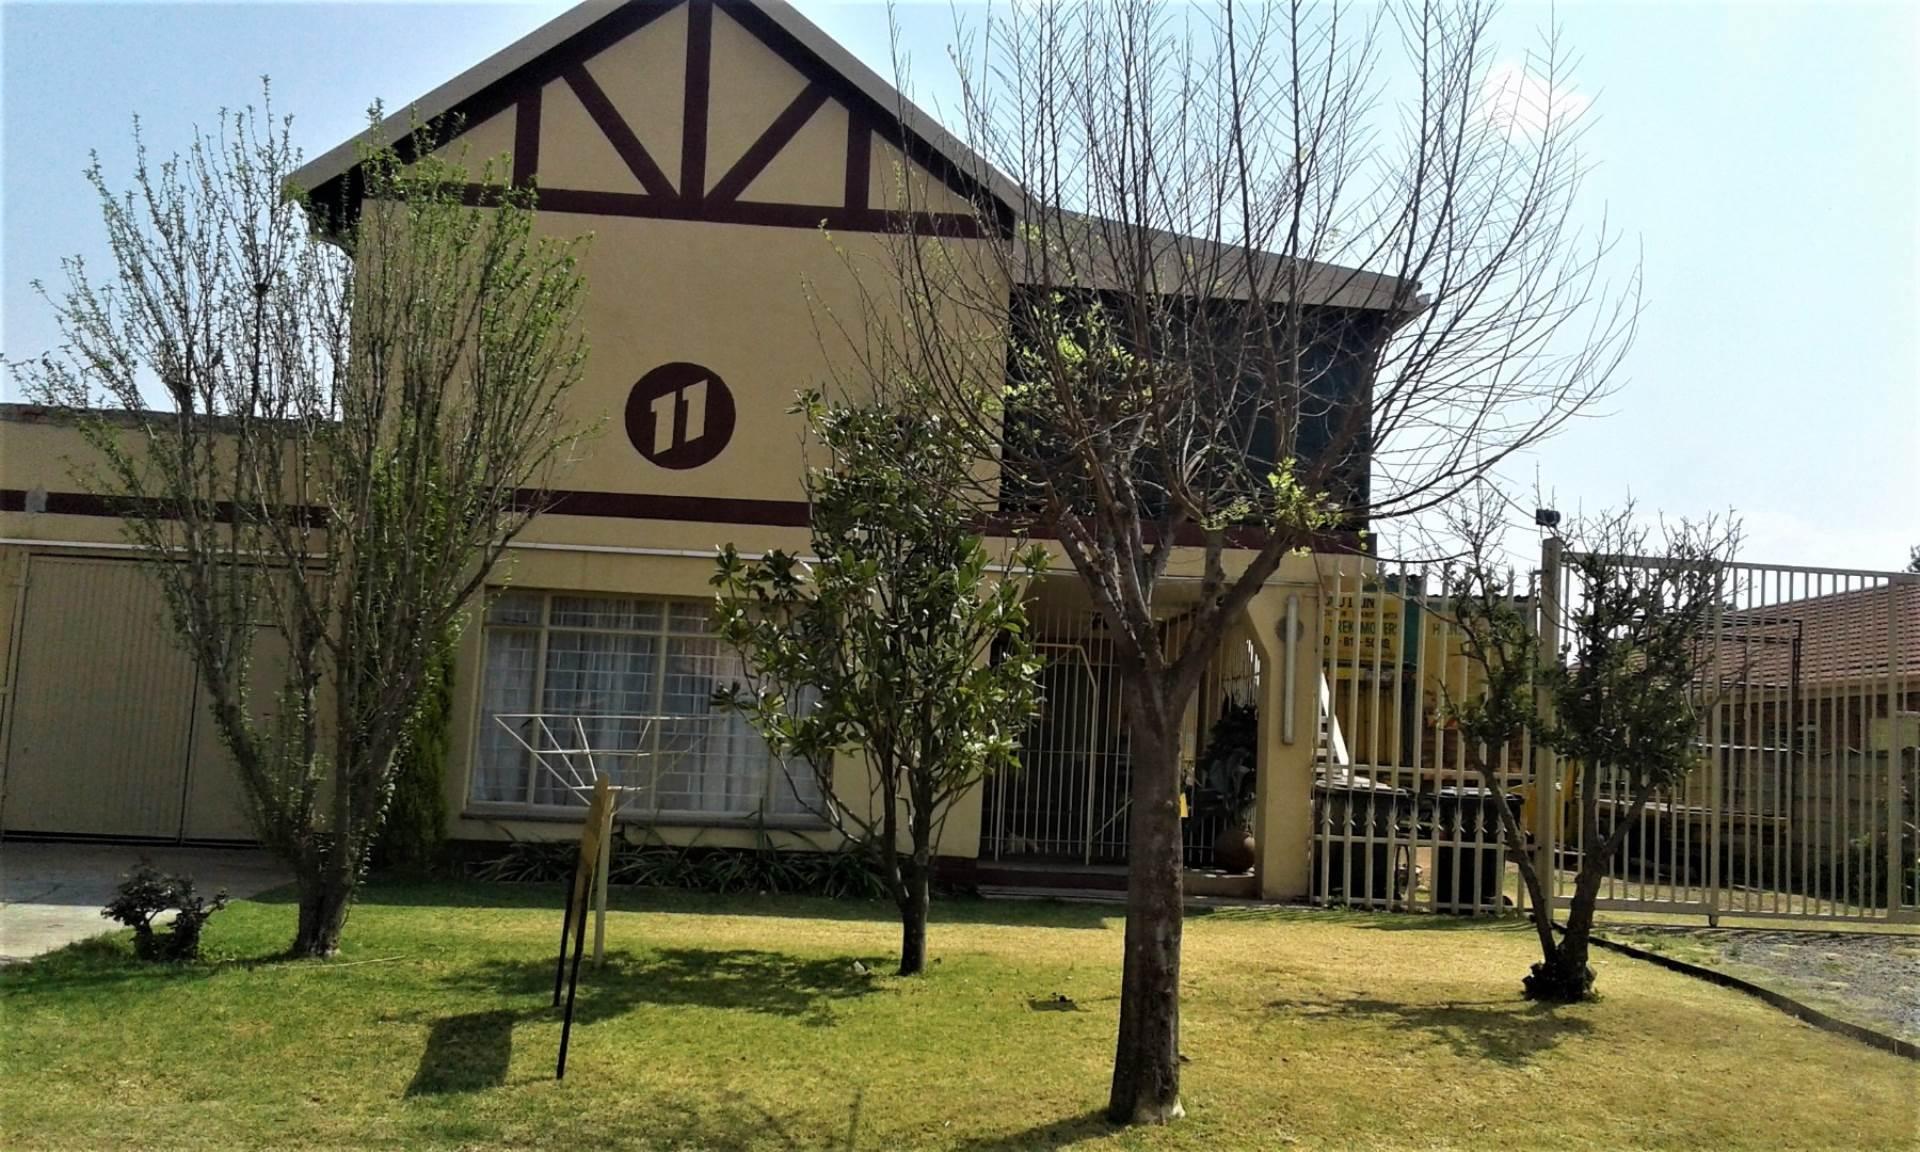 6 BedroomHouse For Sale In Petersfield